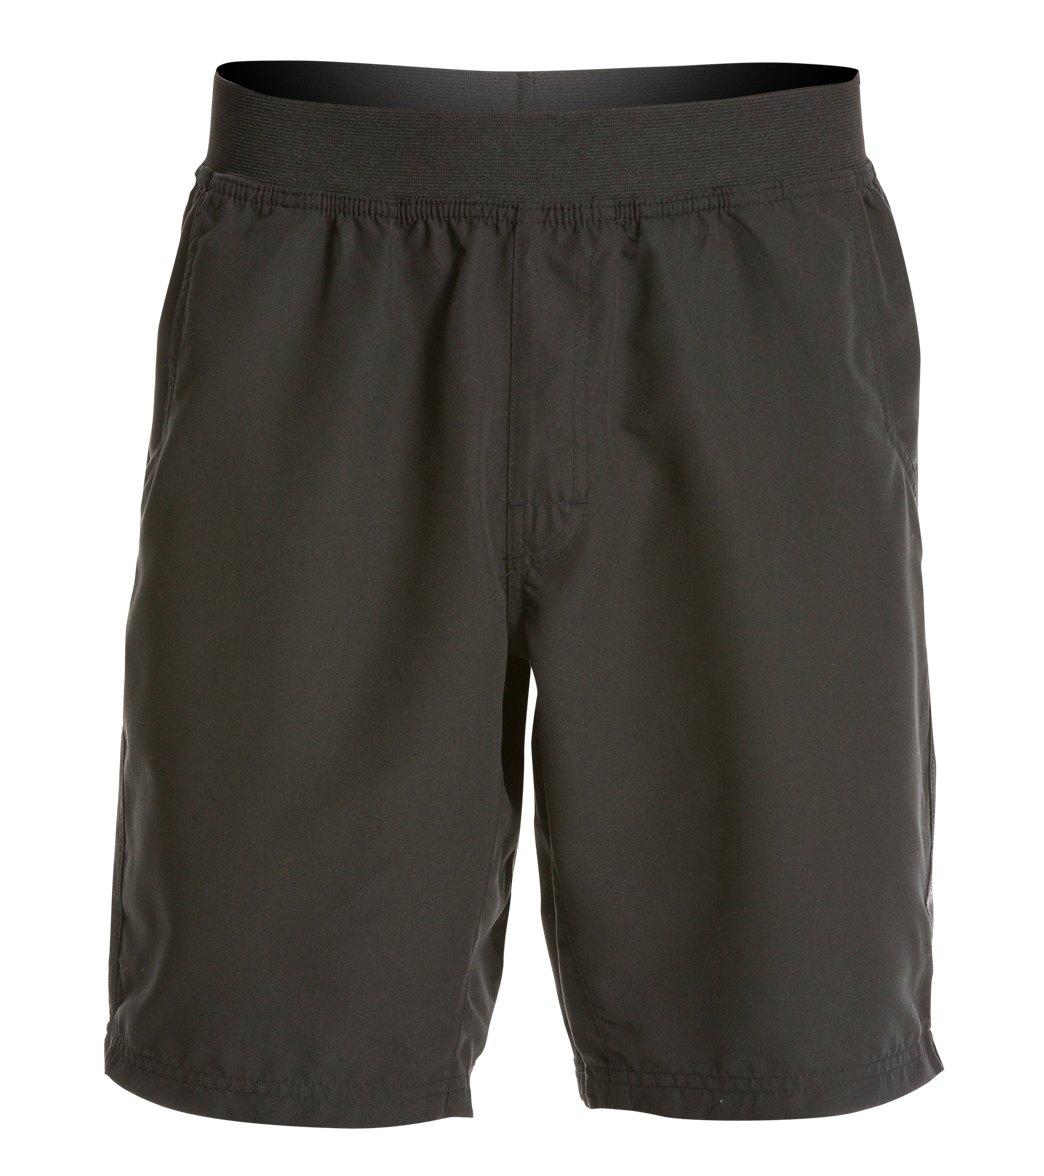 2d52f82555 prAna Men's Mojo Yoga Shorts at YogaOutlet.com - Free Shipping